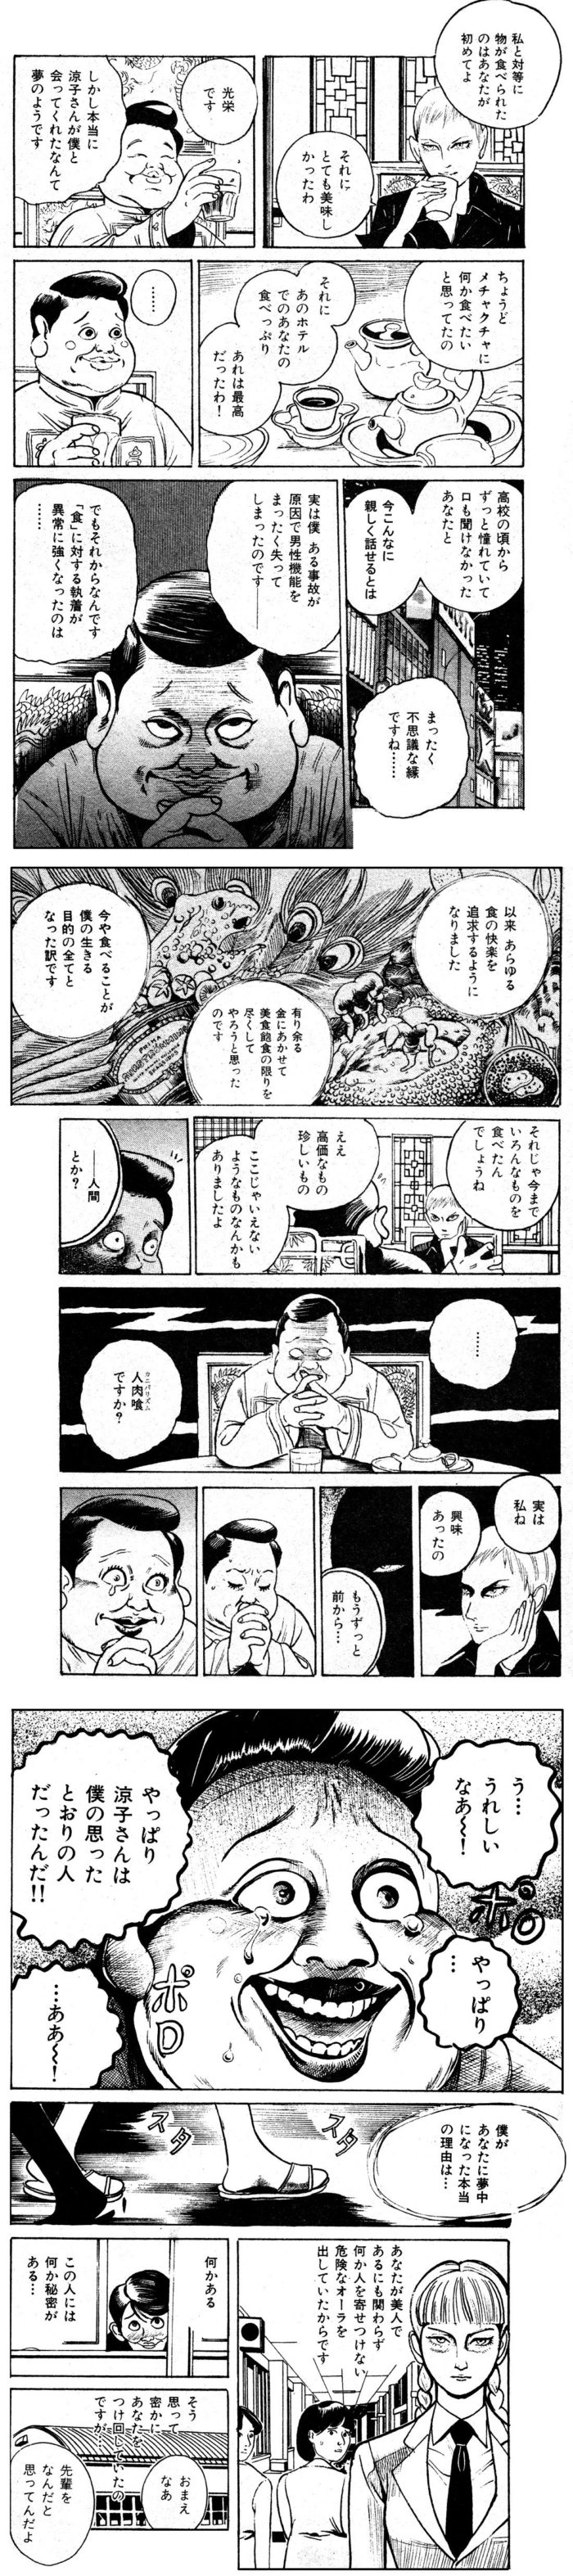 hitokui04